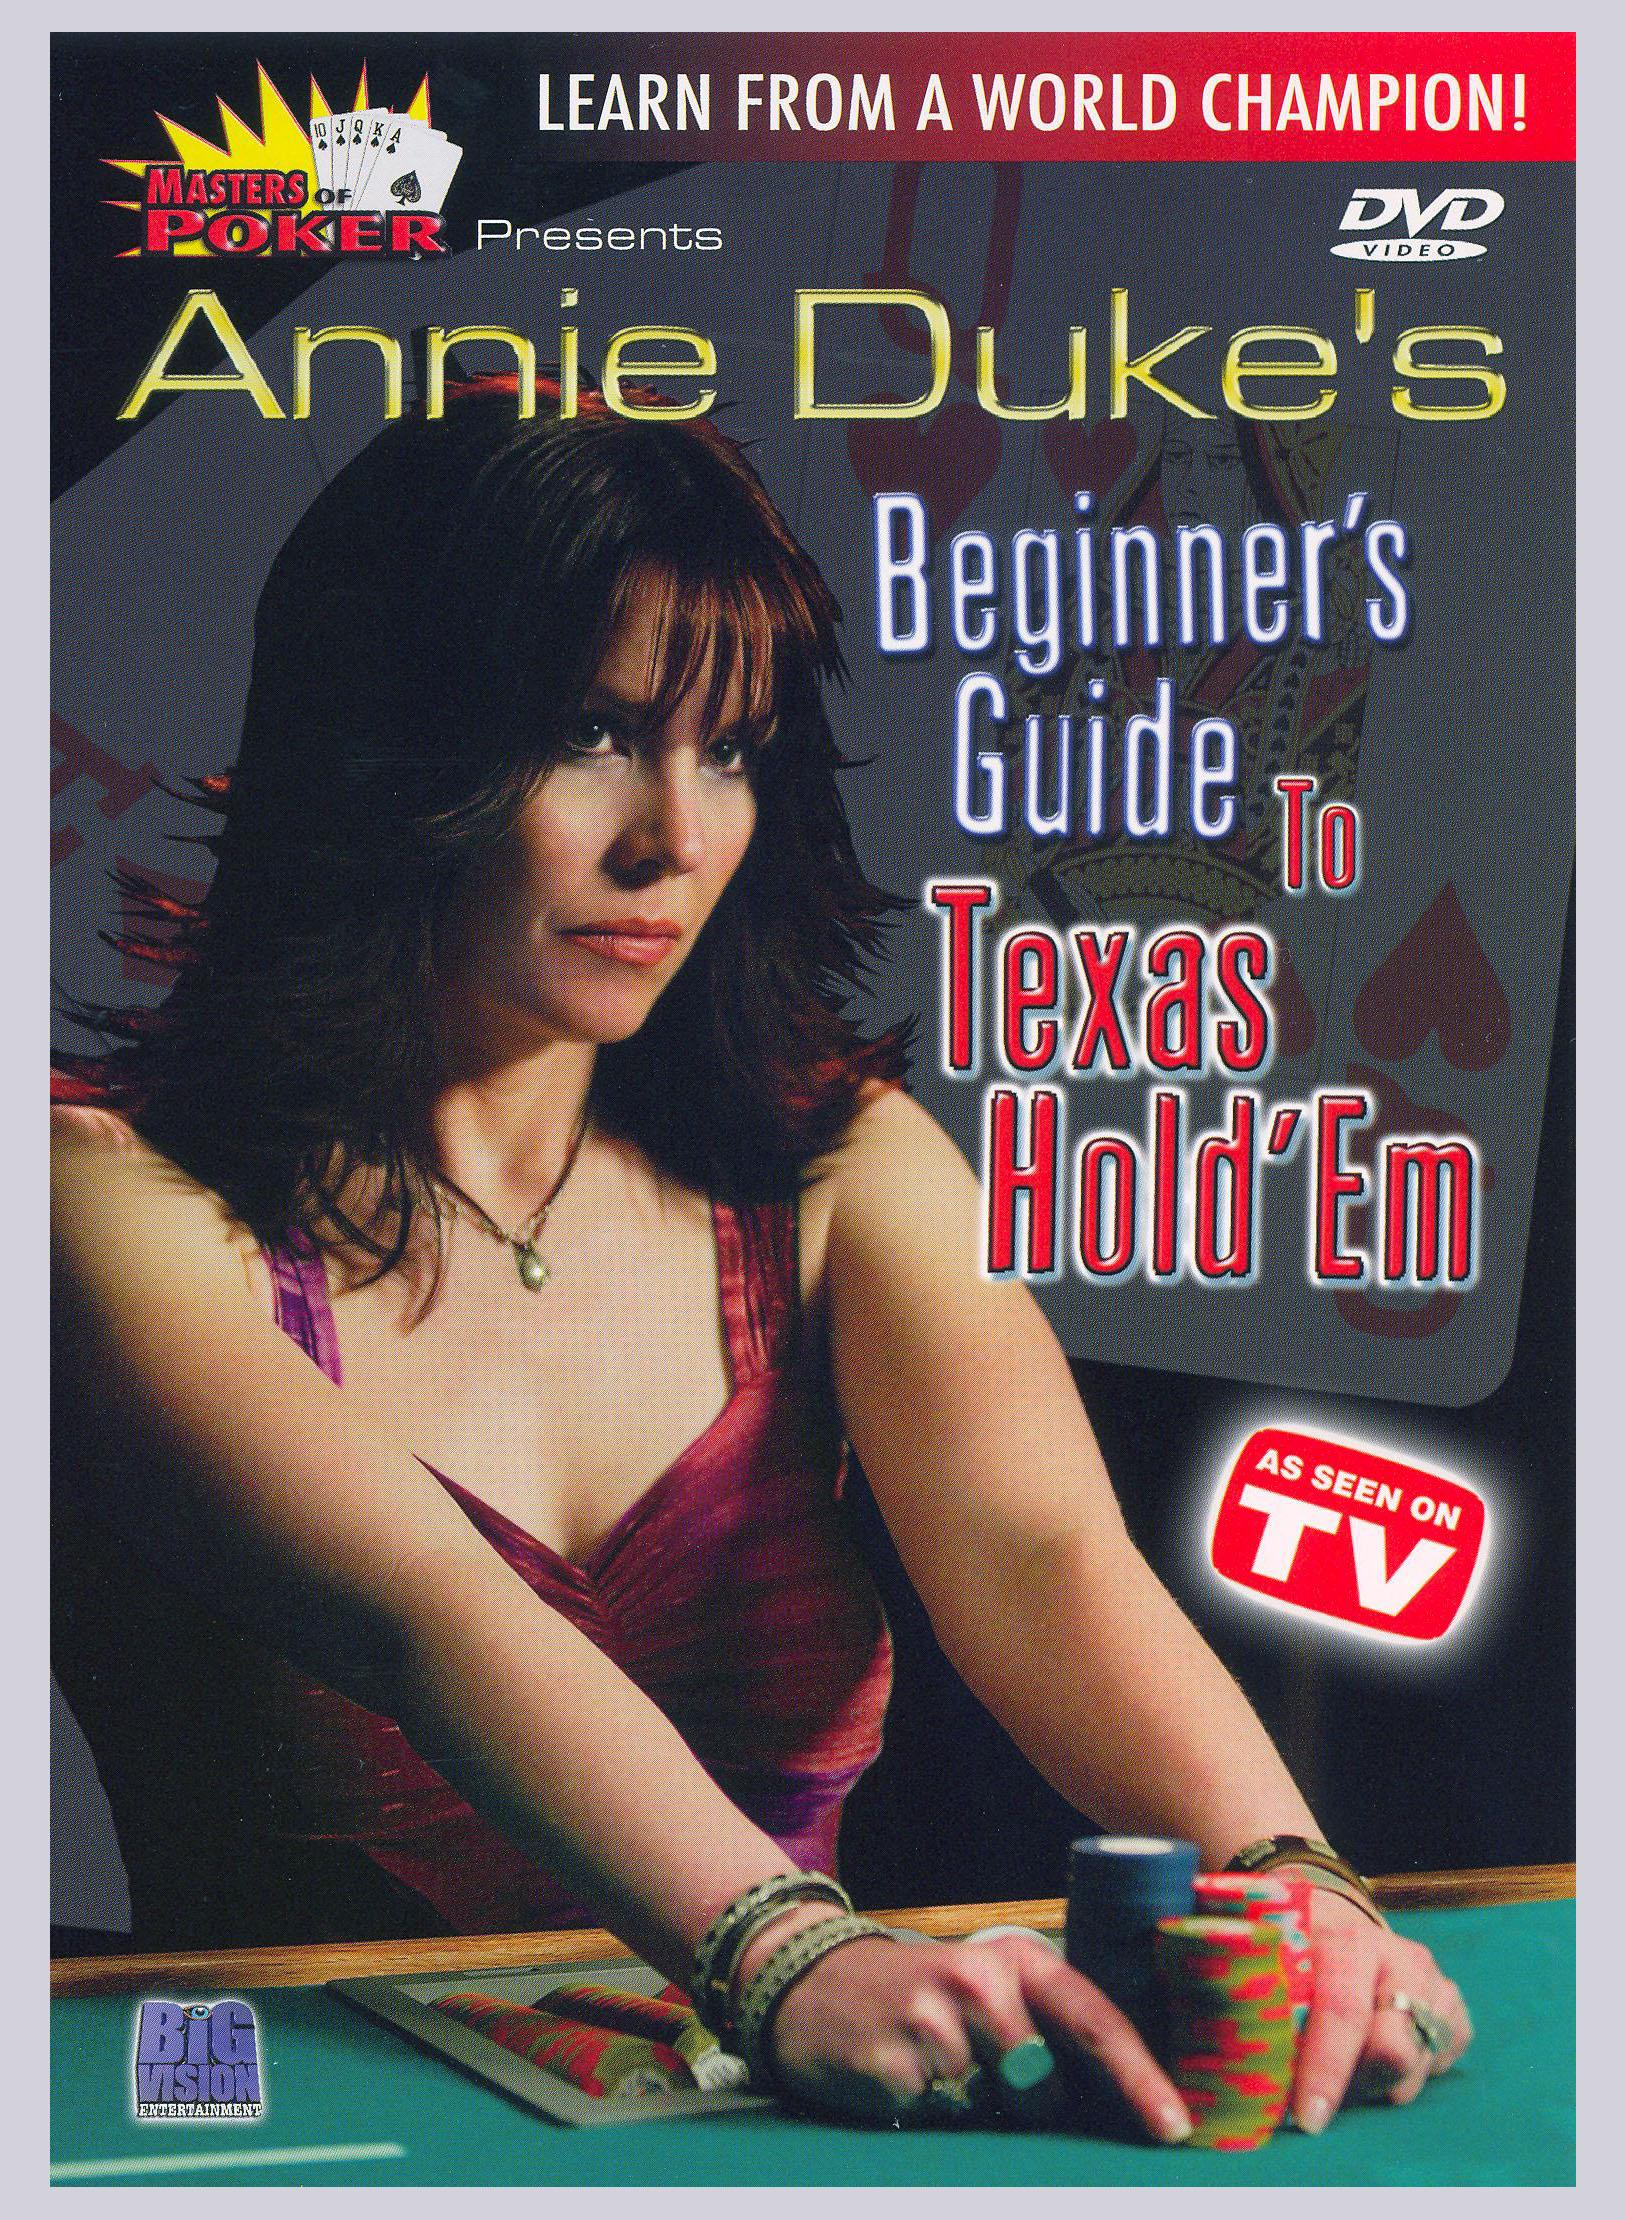 Masters of Poker: Annie Duke's Beginner's Guide to Texas Hold'em